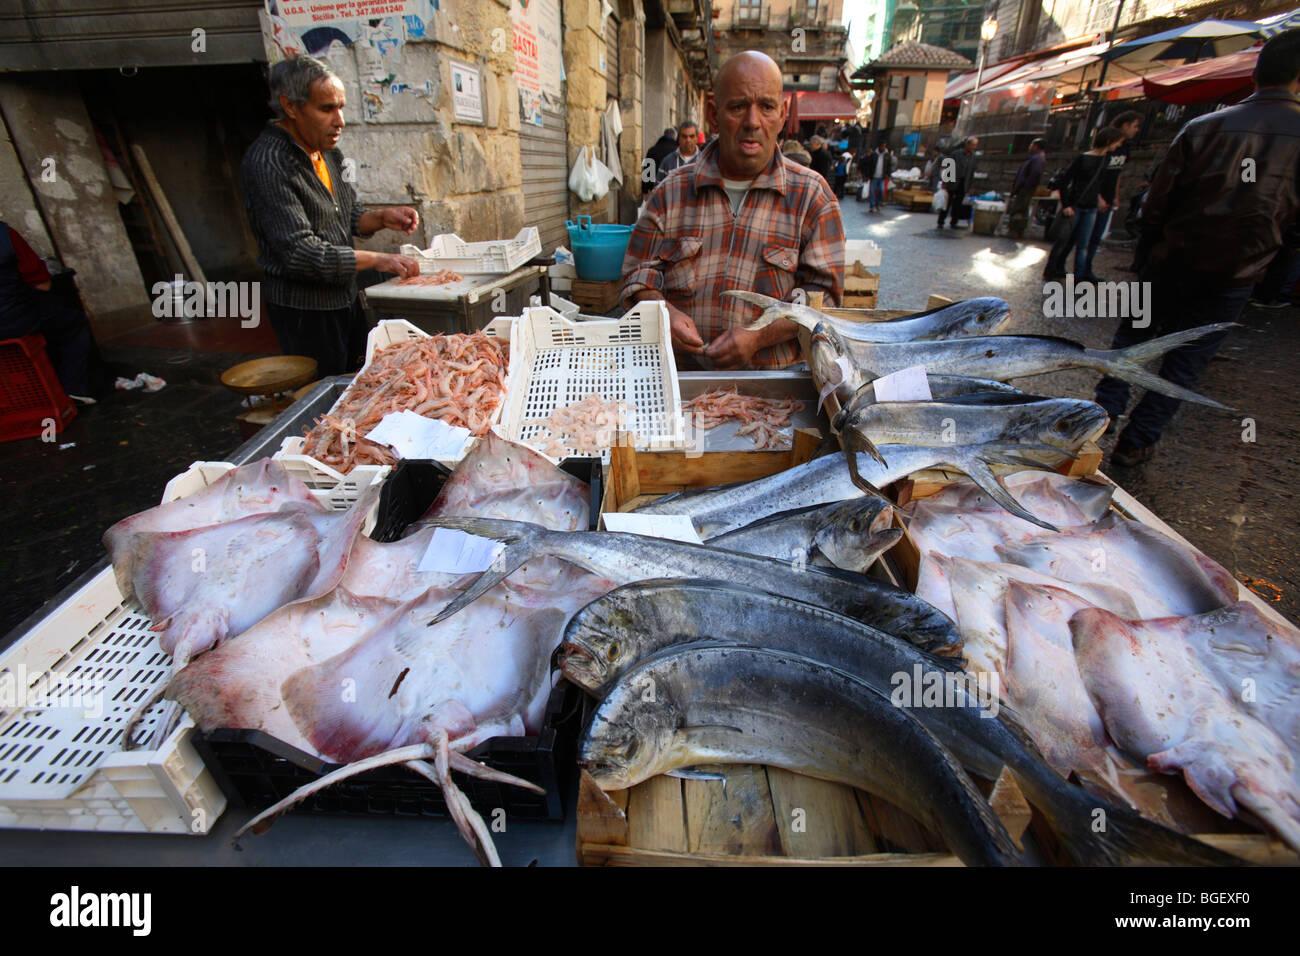 The fish market in catania sicily italy stock photo for Fish market ct